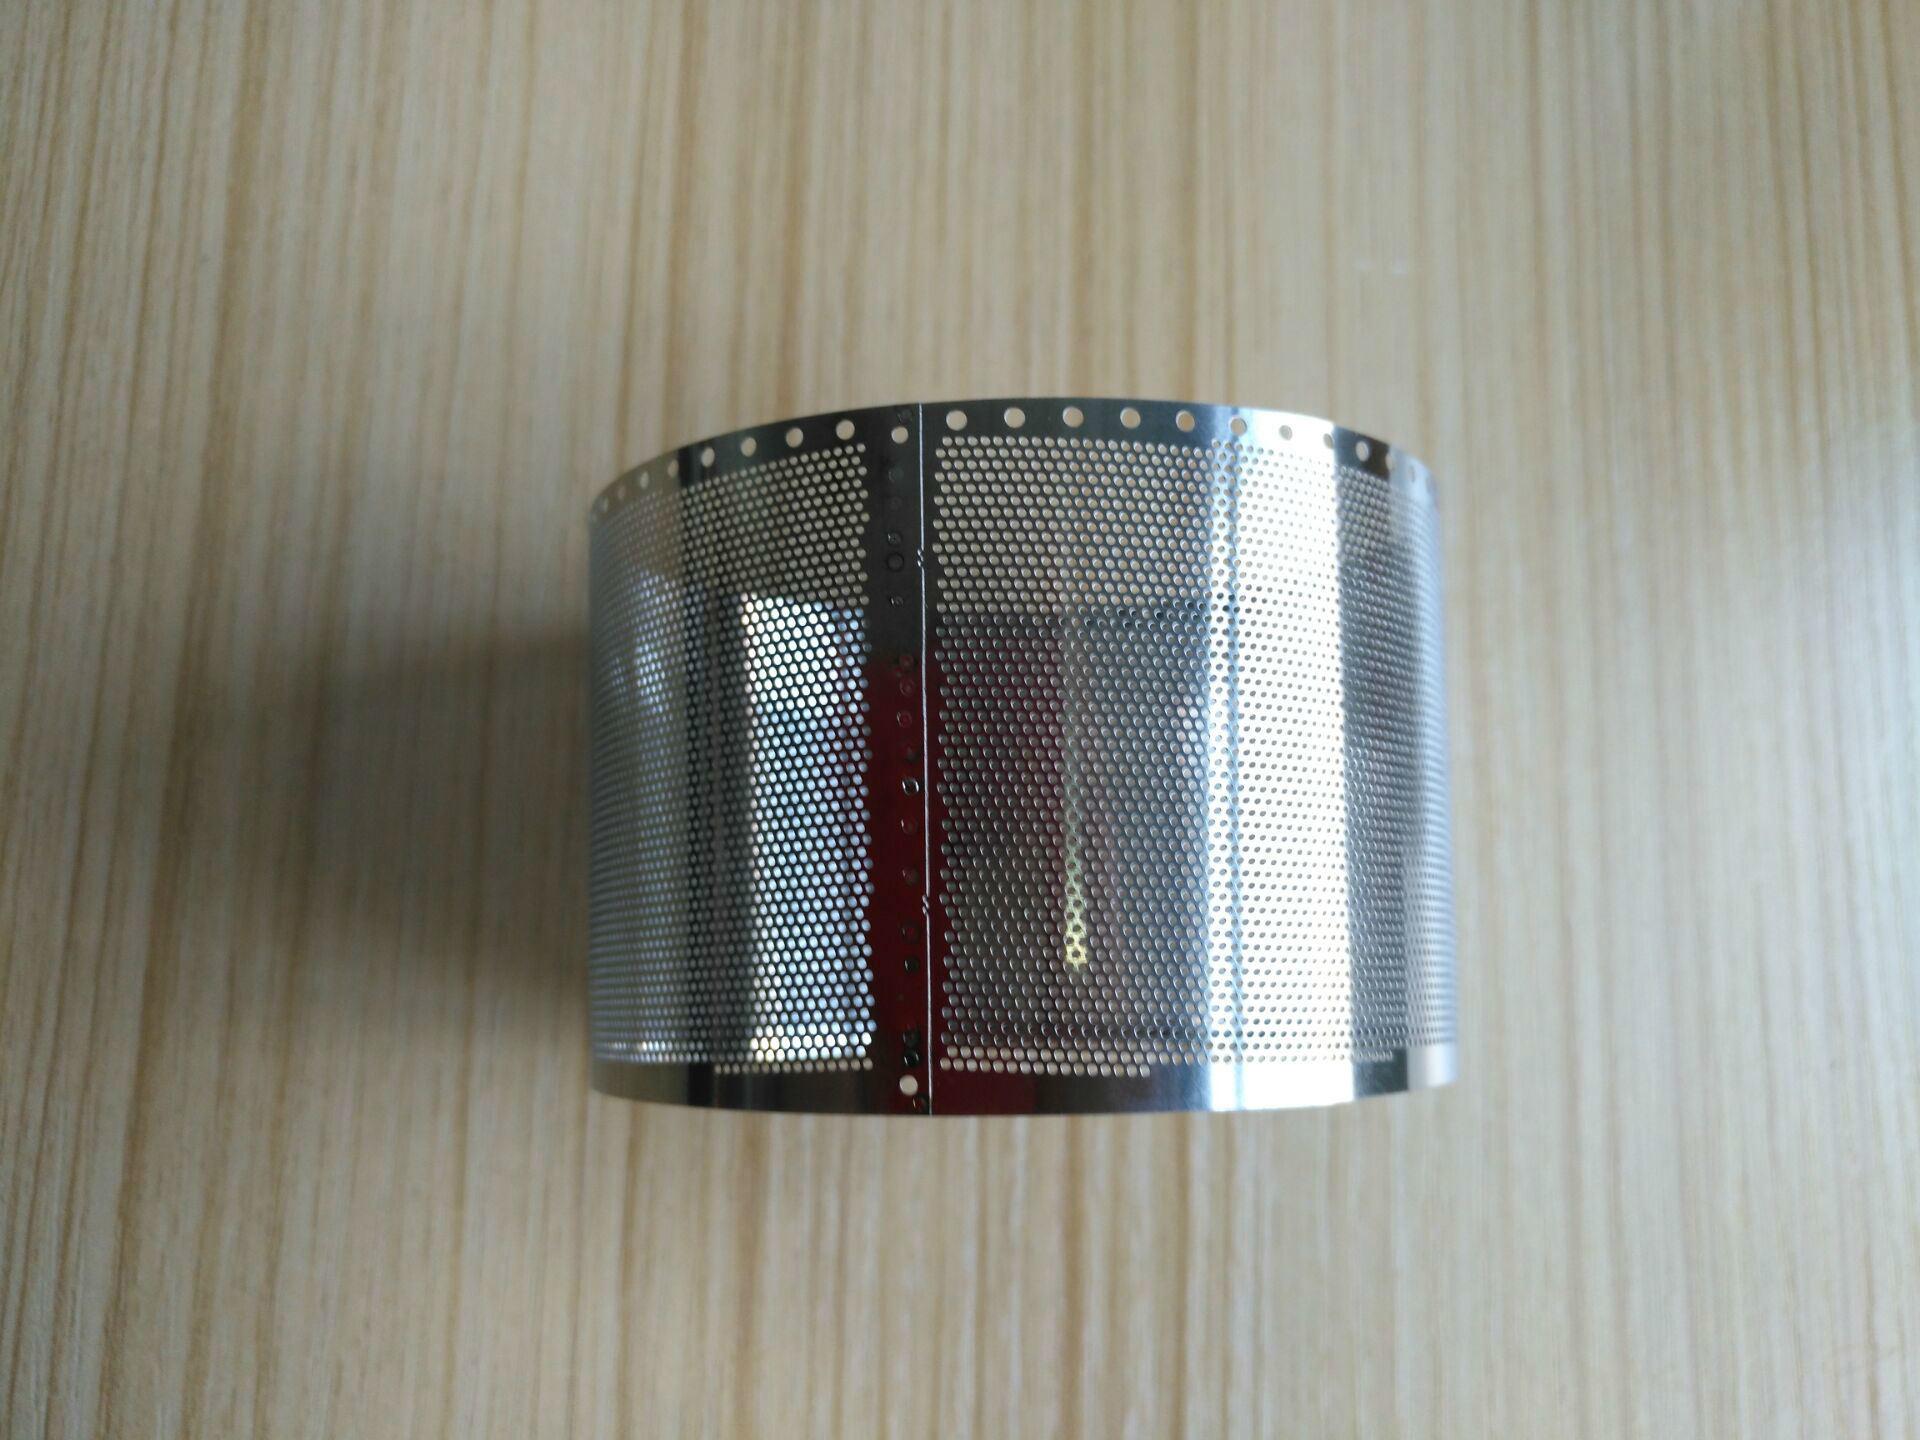 Automatic Metal Battery Mould Repairing Fiber Laser Spot Welding Machine